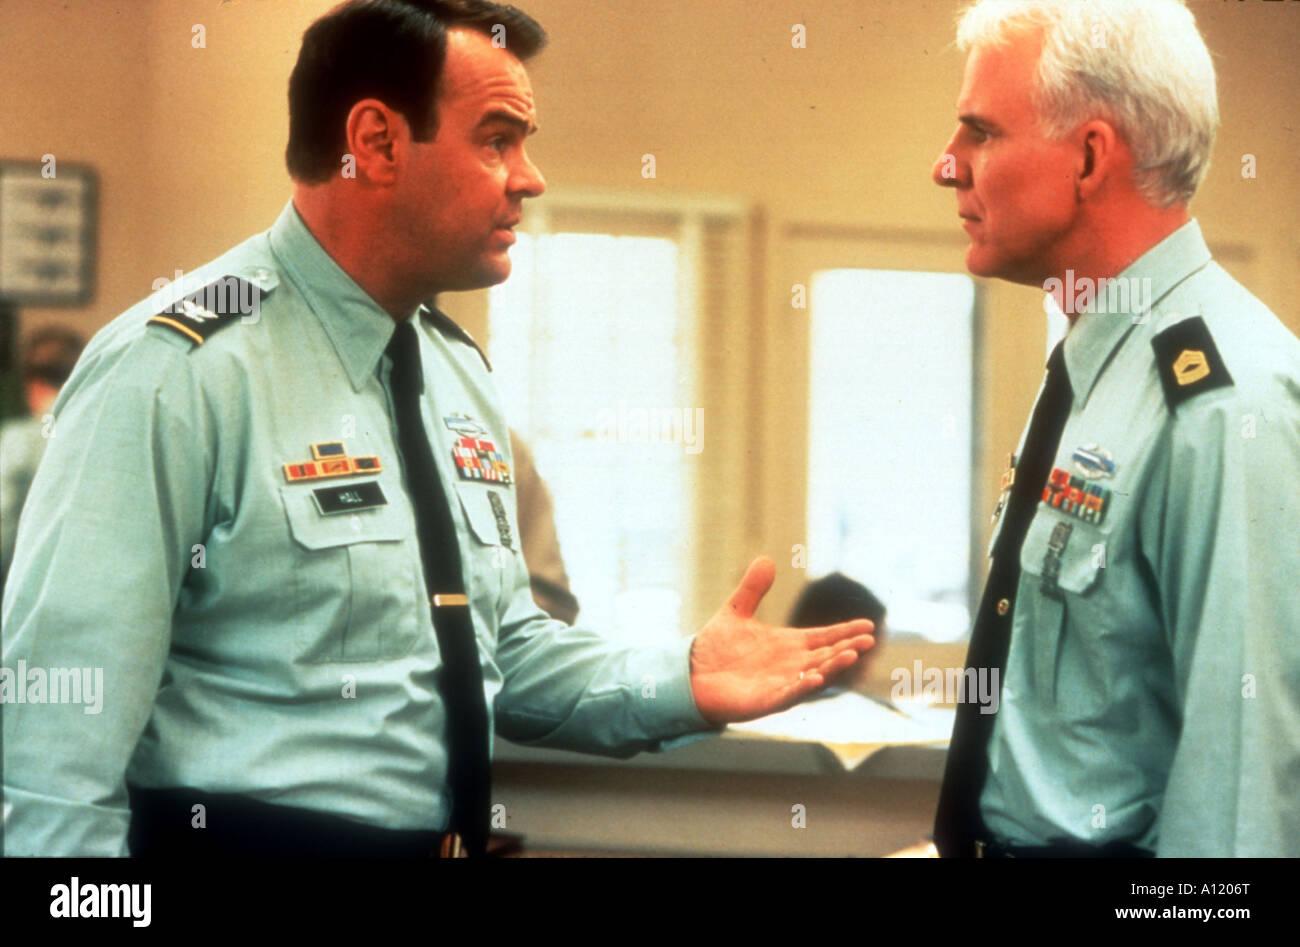 Sgt Bilko Year 1997 Director Johnathan Lynn Steve Martin Dan Aykroyd - Stock Image